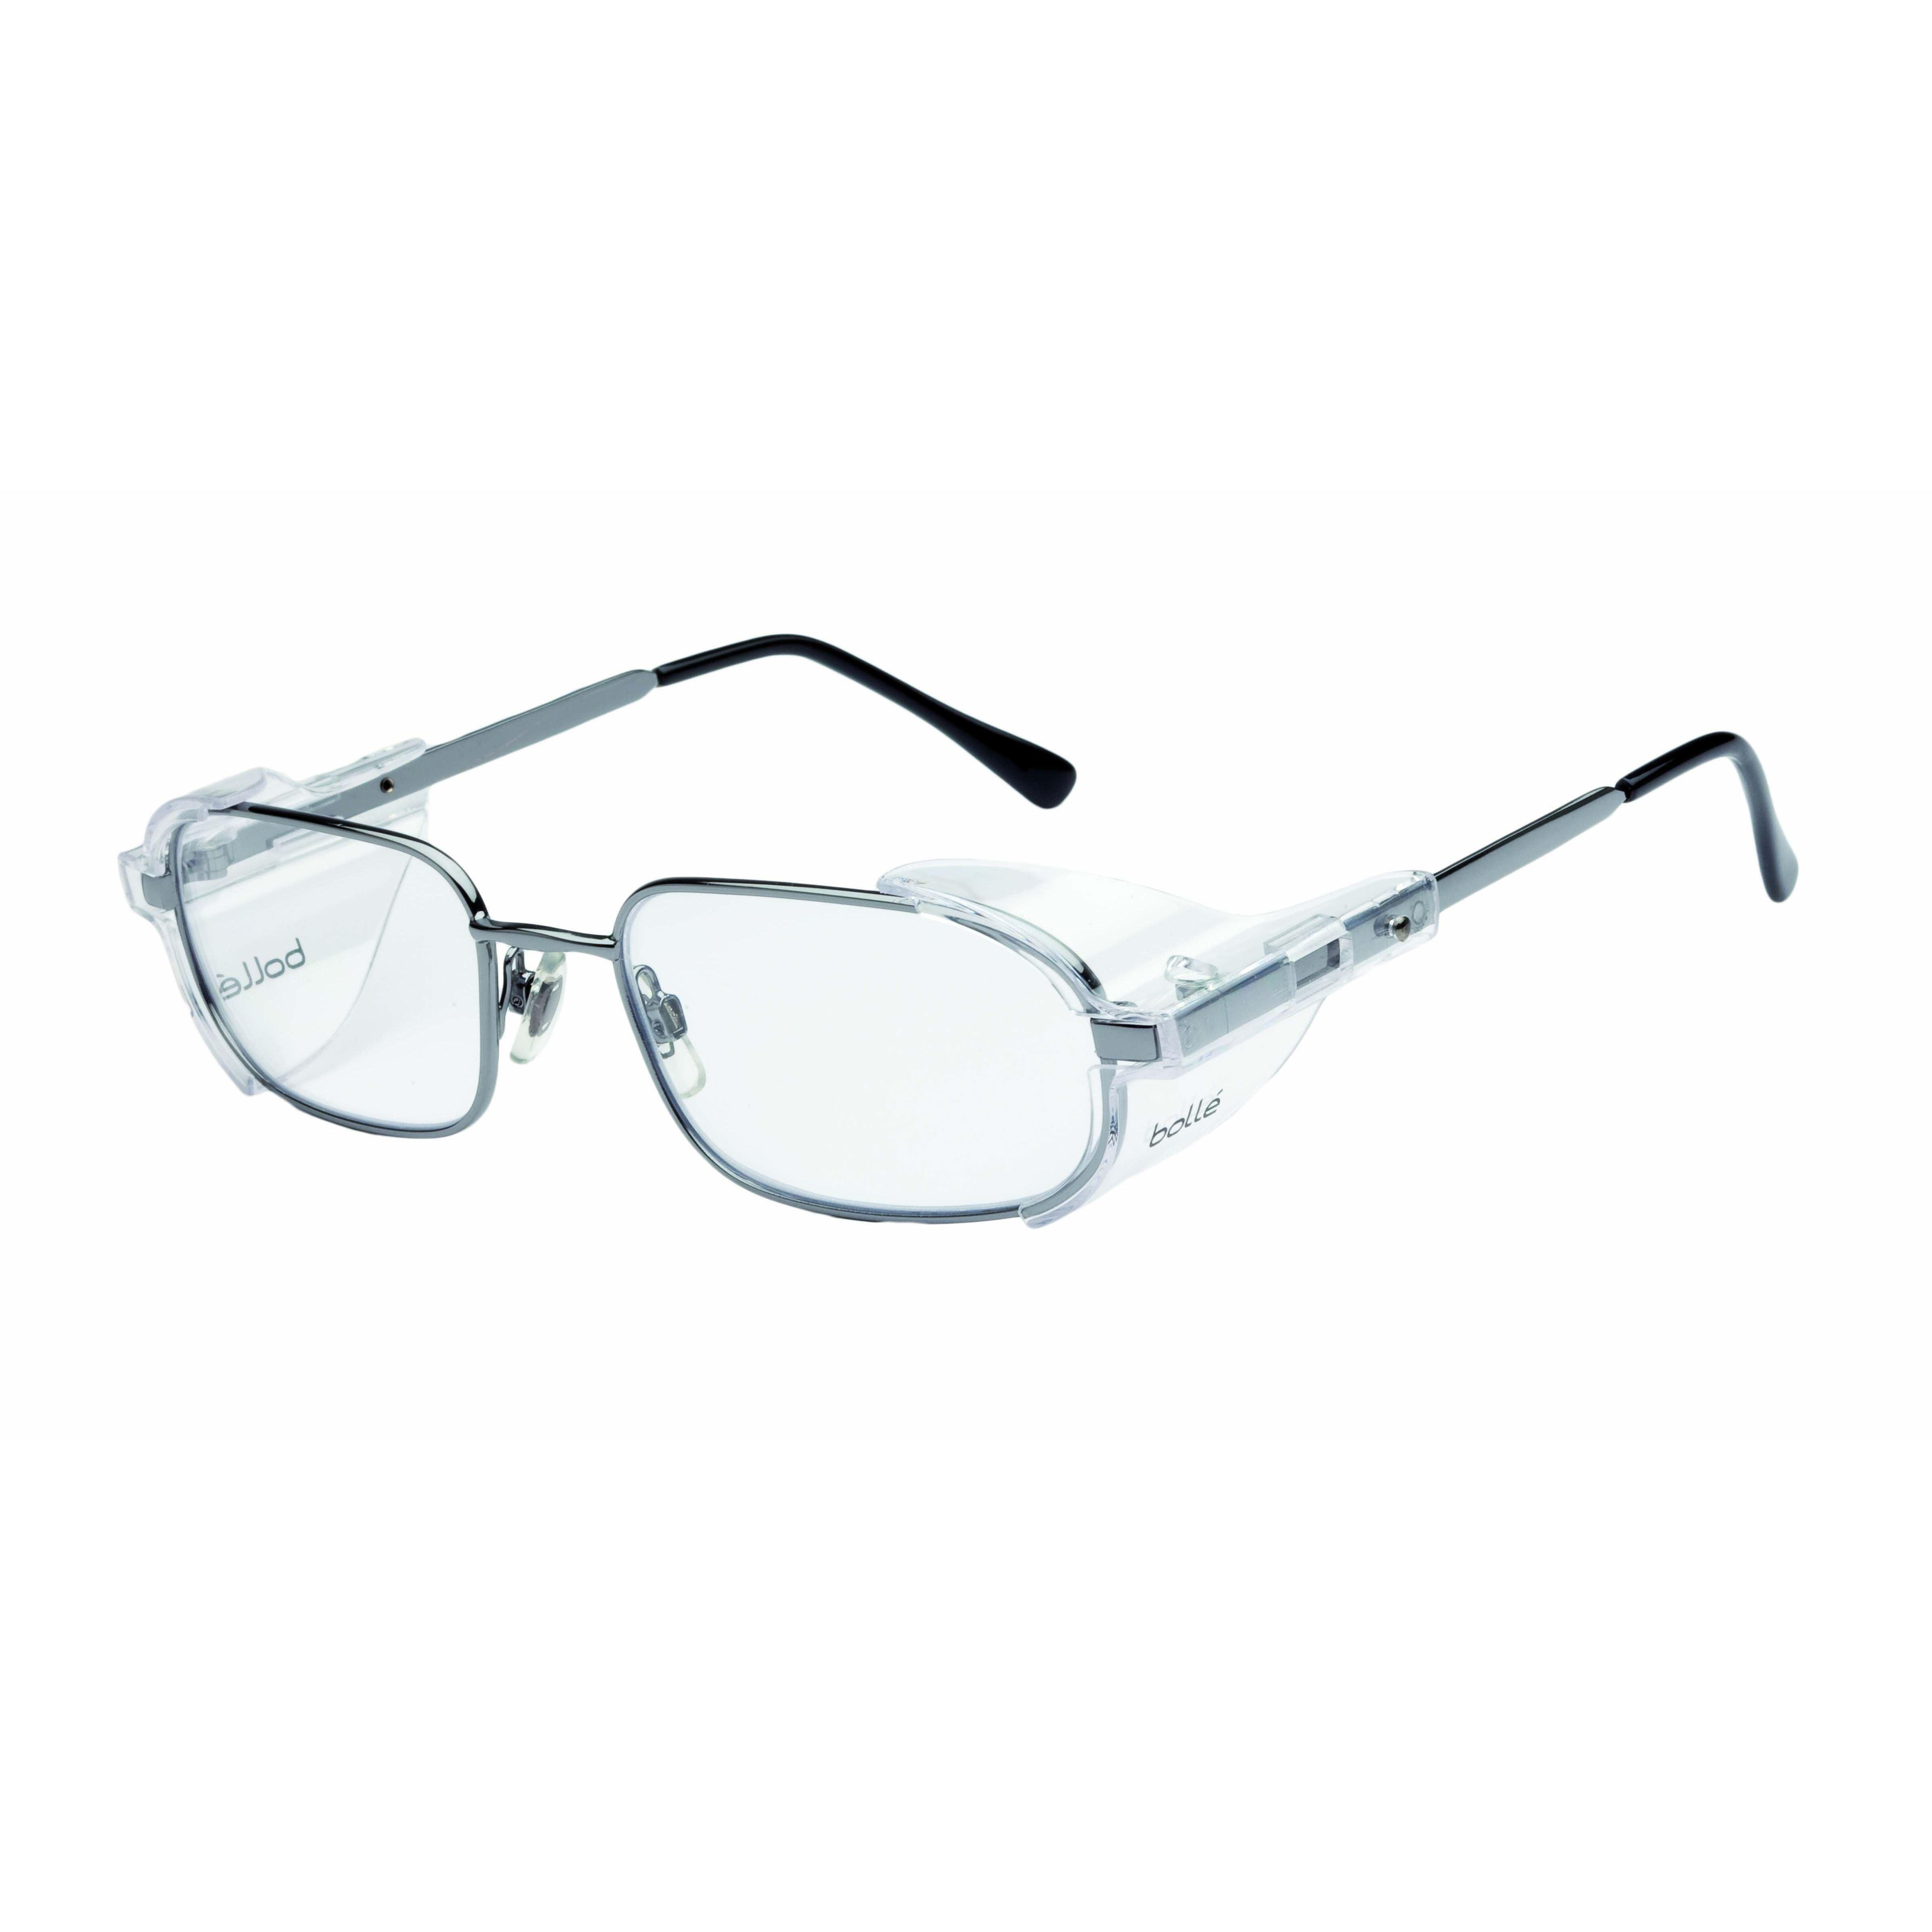 1745c95a27092 Buy Bolle OMF167 Prescription Safety Glasses - RX Safety